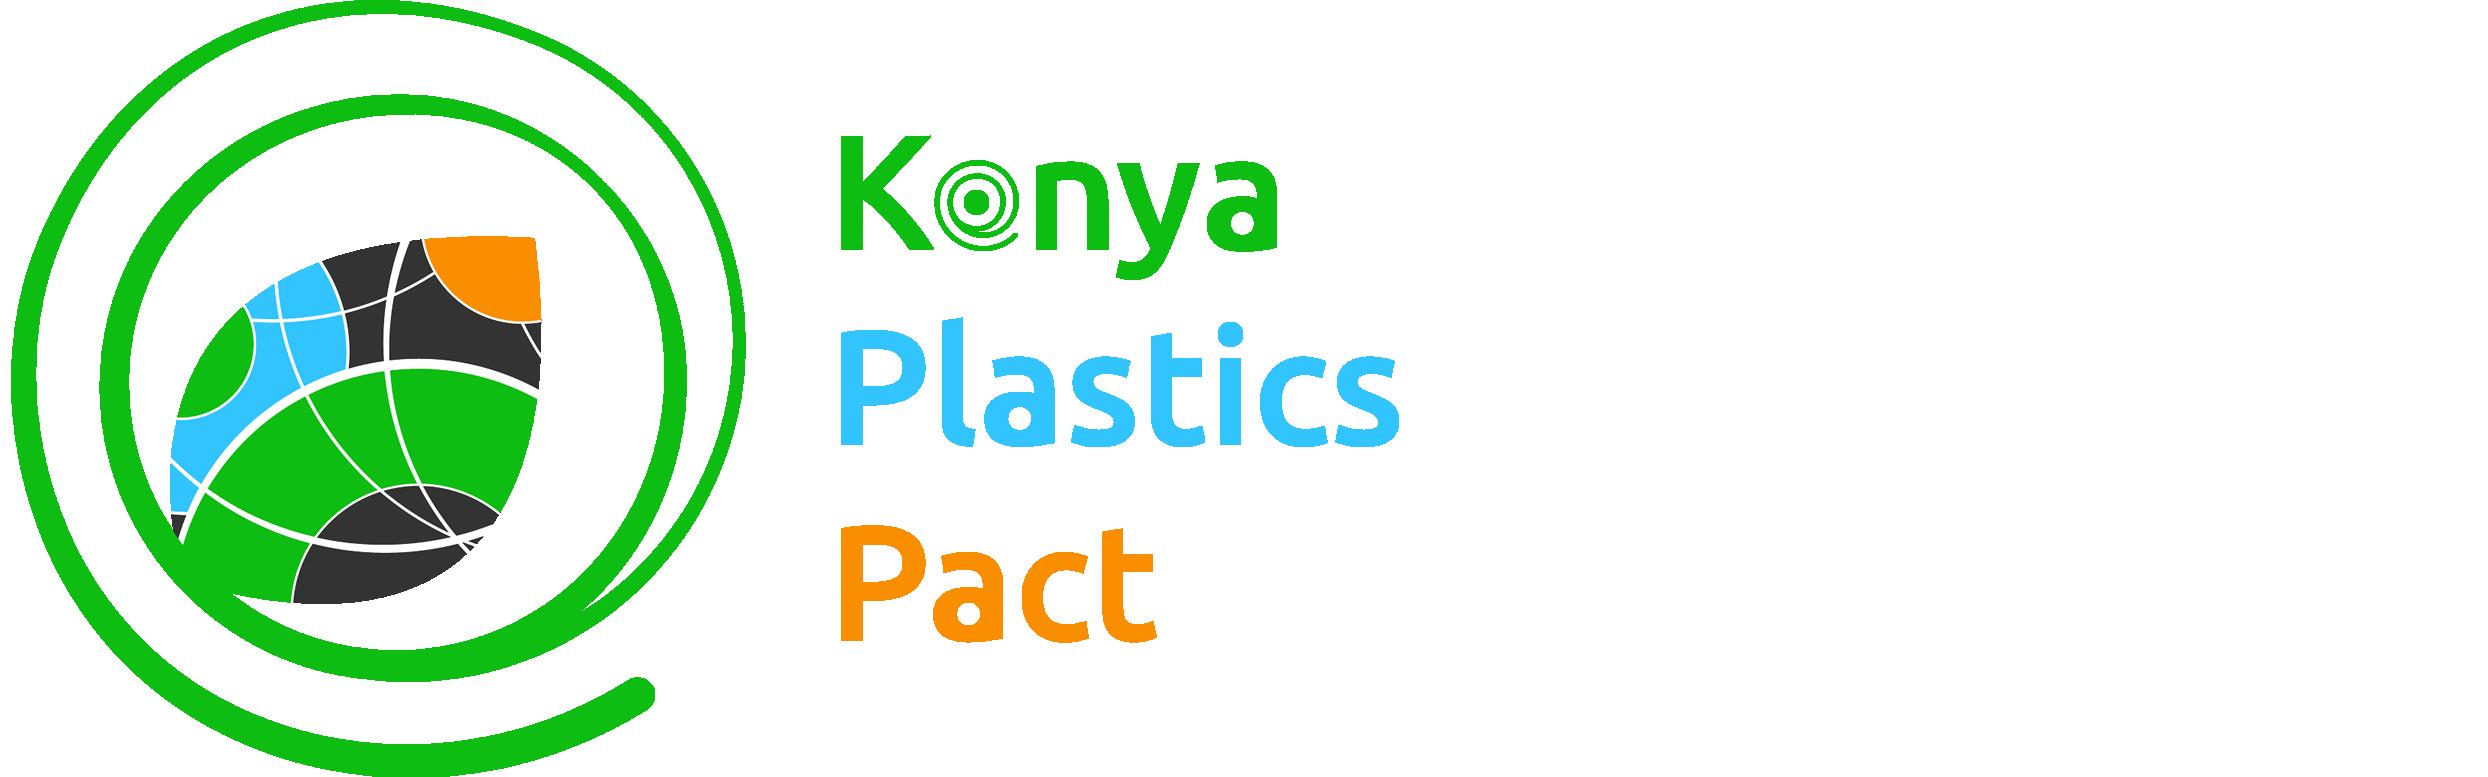 Kenya Plastics Pact